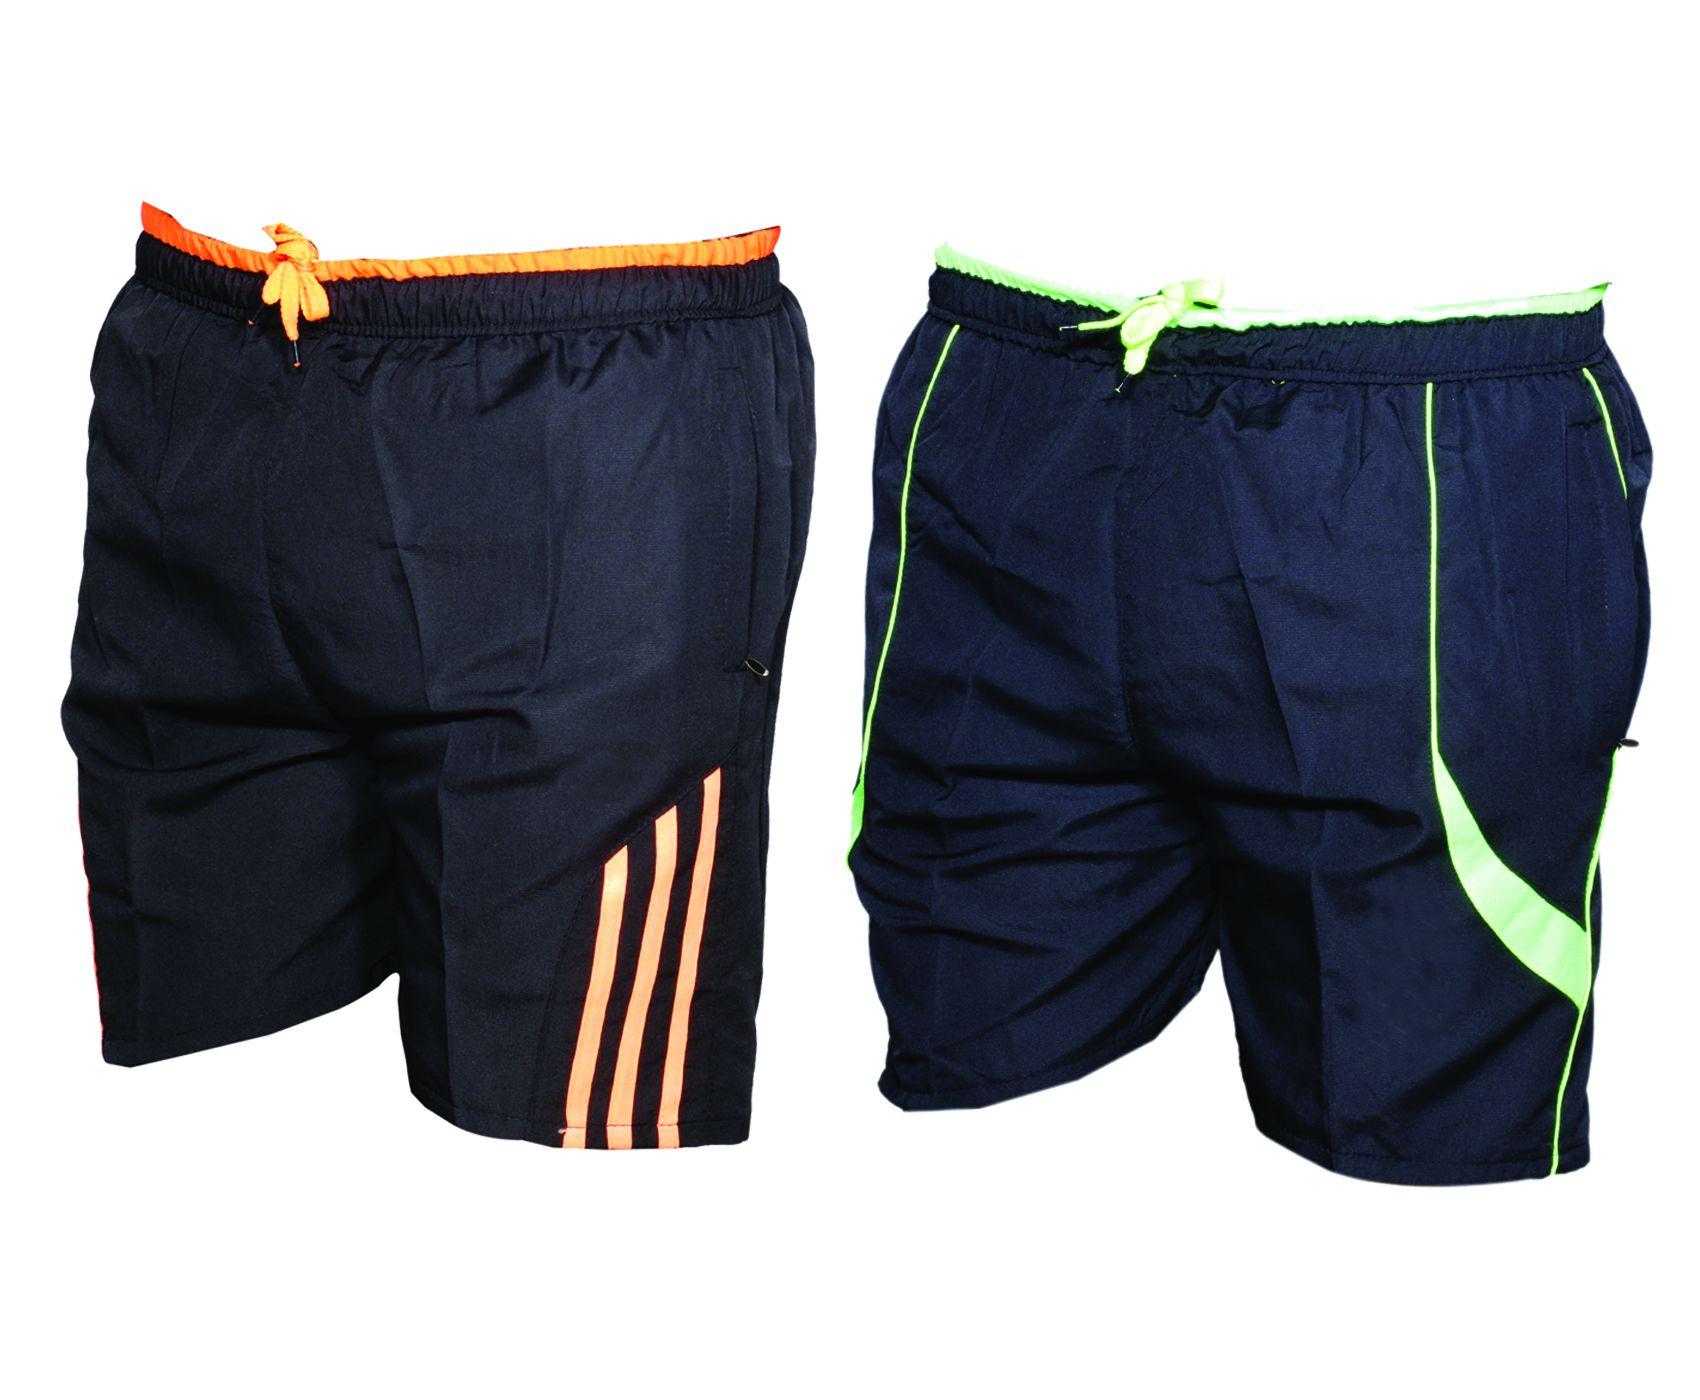 IndiWeaves Multi Shorts (Pack of 2 Sports Shorts/Bermuda)